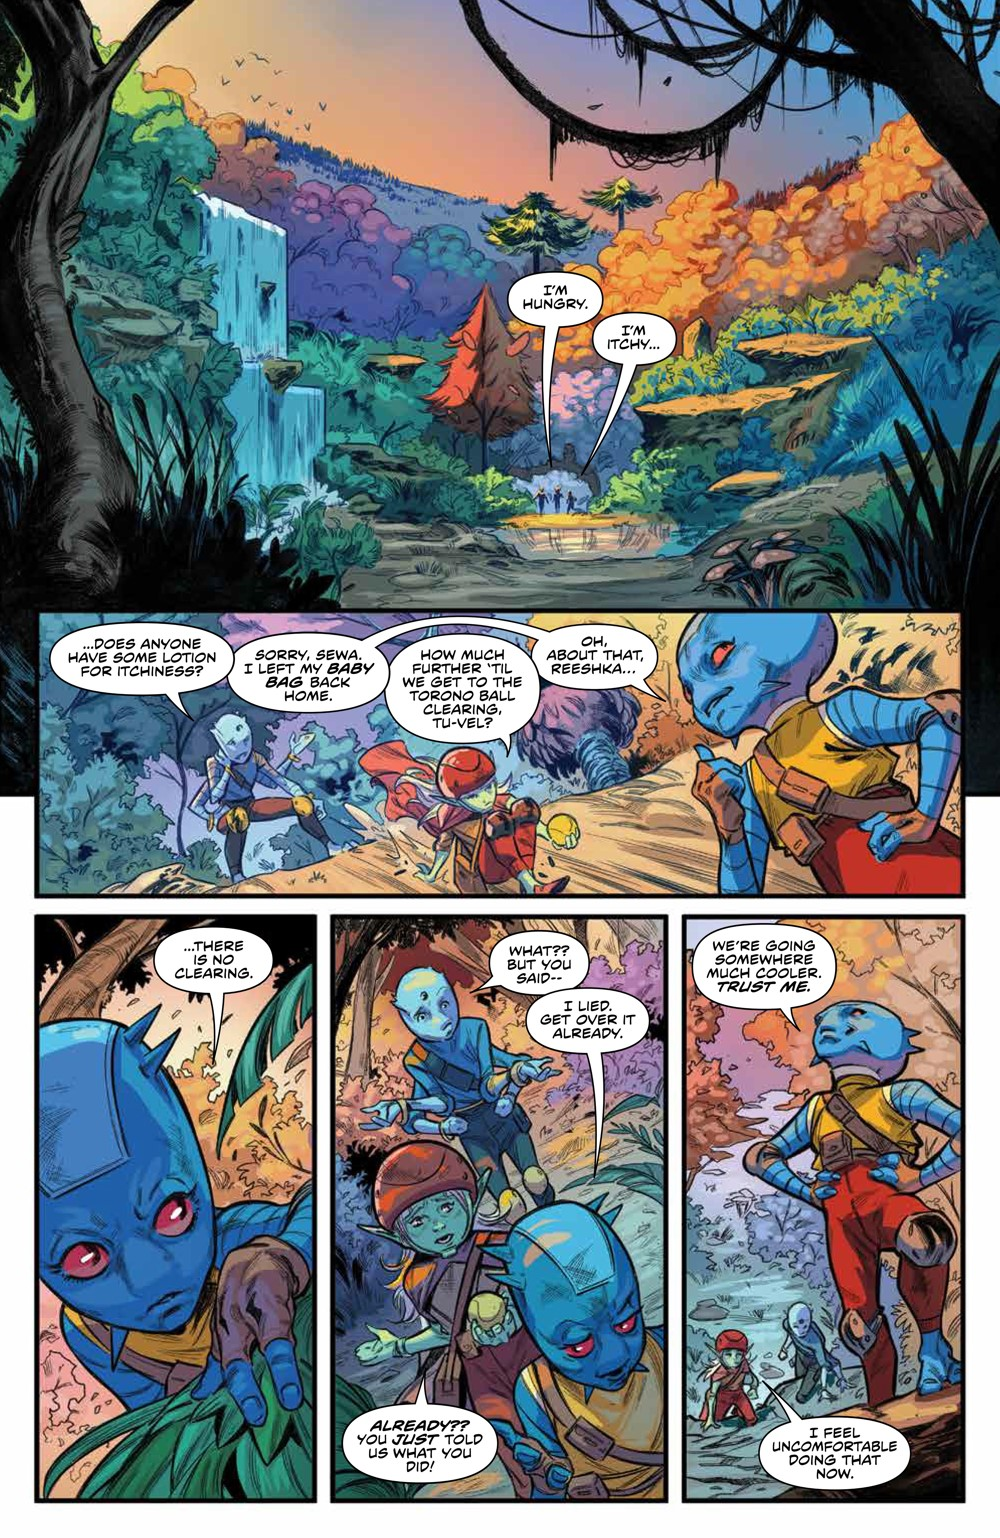 PowerRangers_010_PRESS_8 ComicList Previews: POWER RANGERS #10